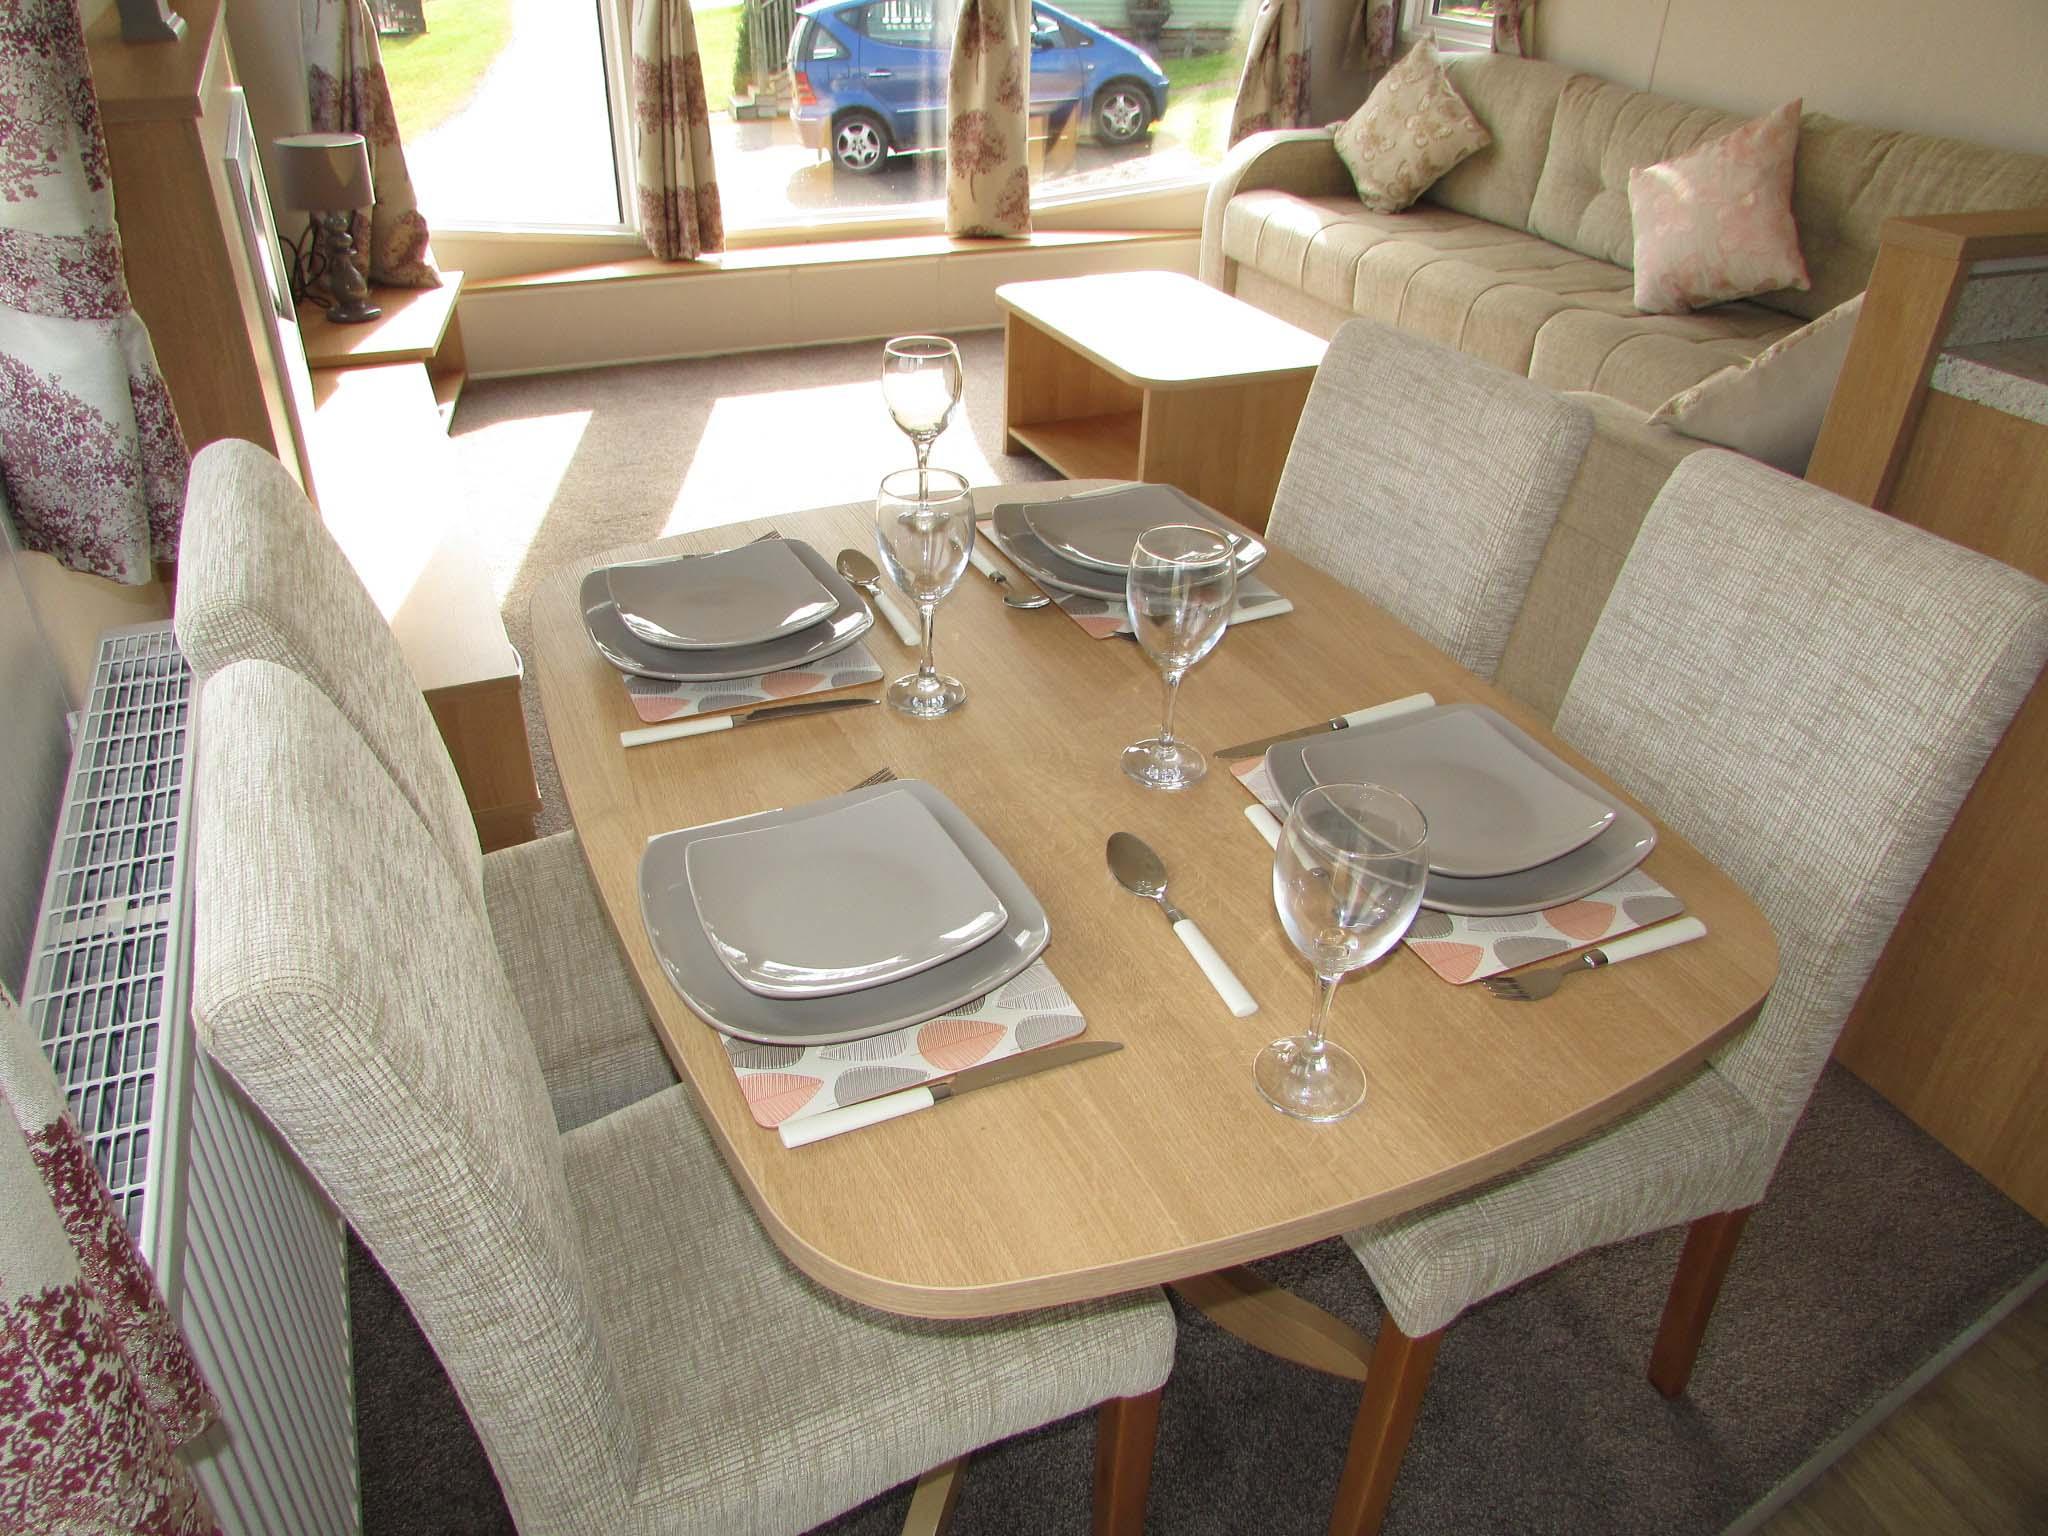 Willerby Sierra 2017 dining table